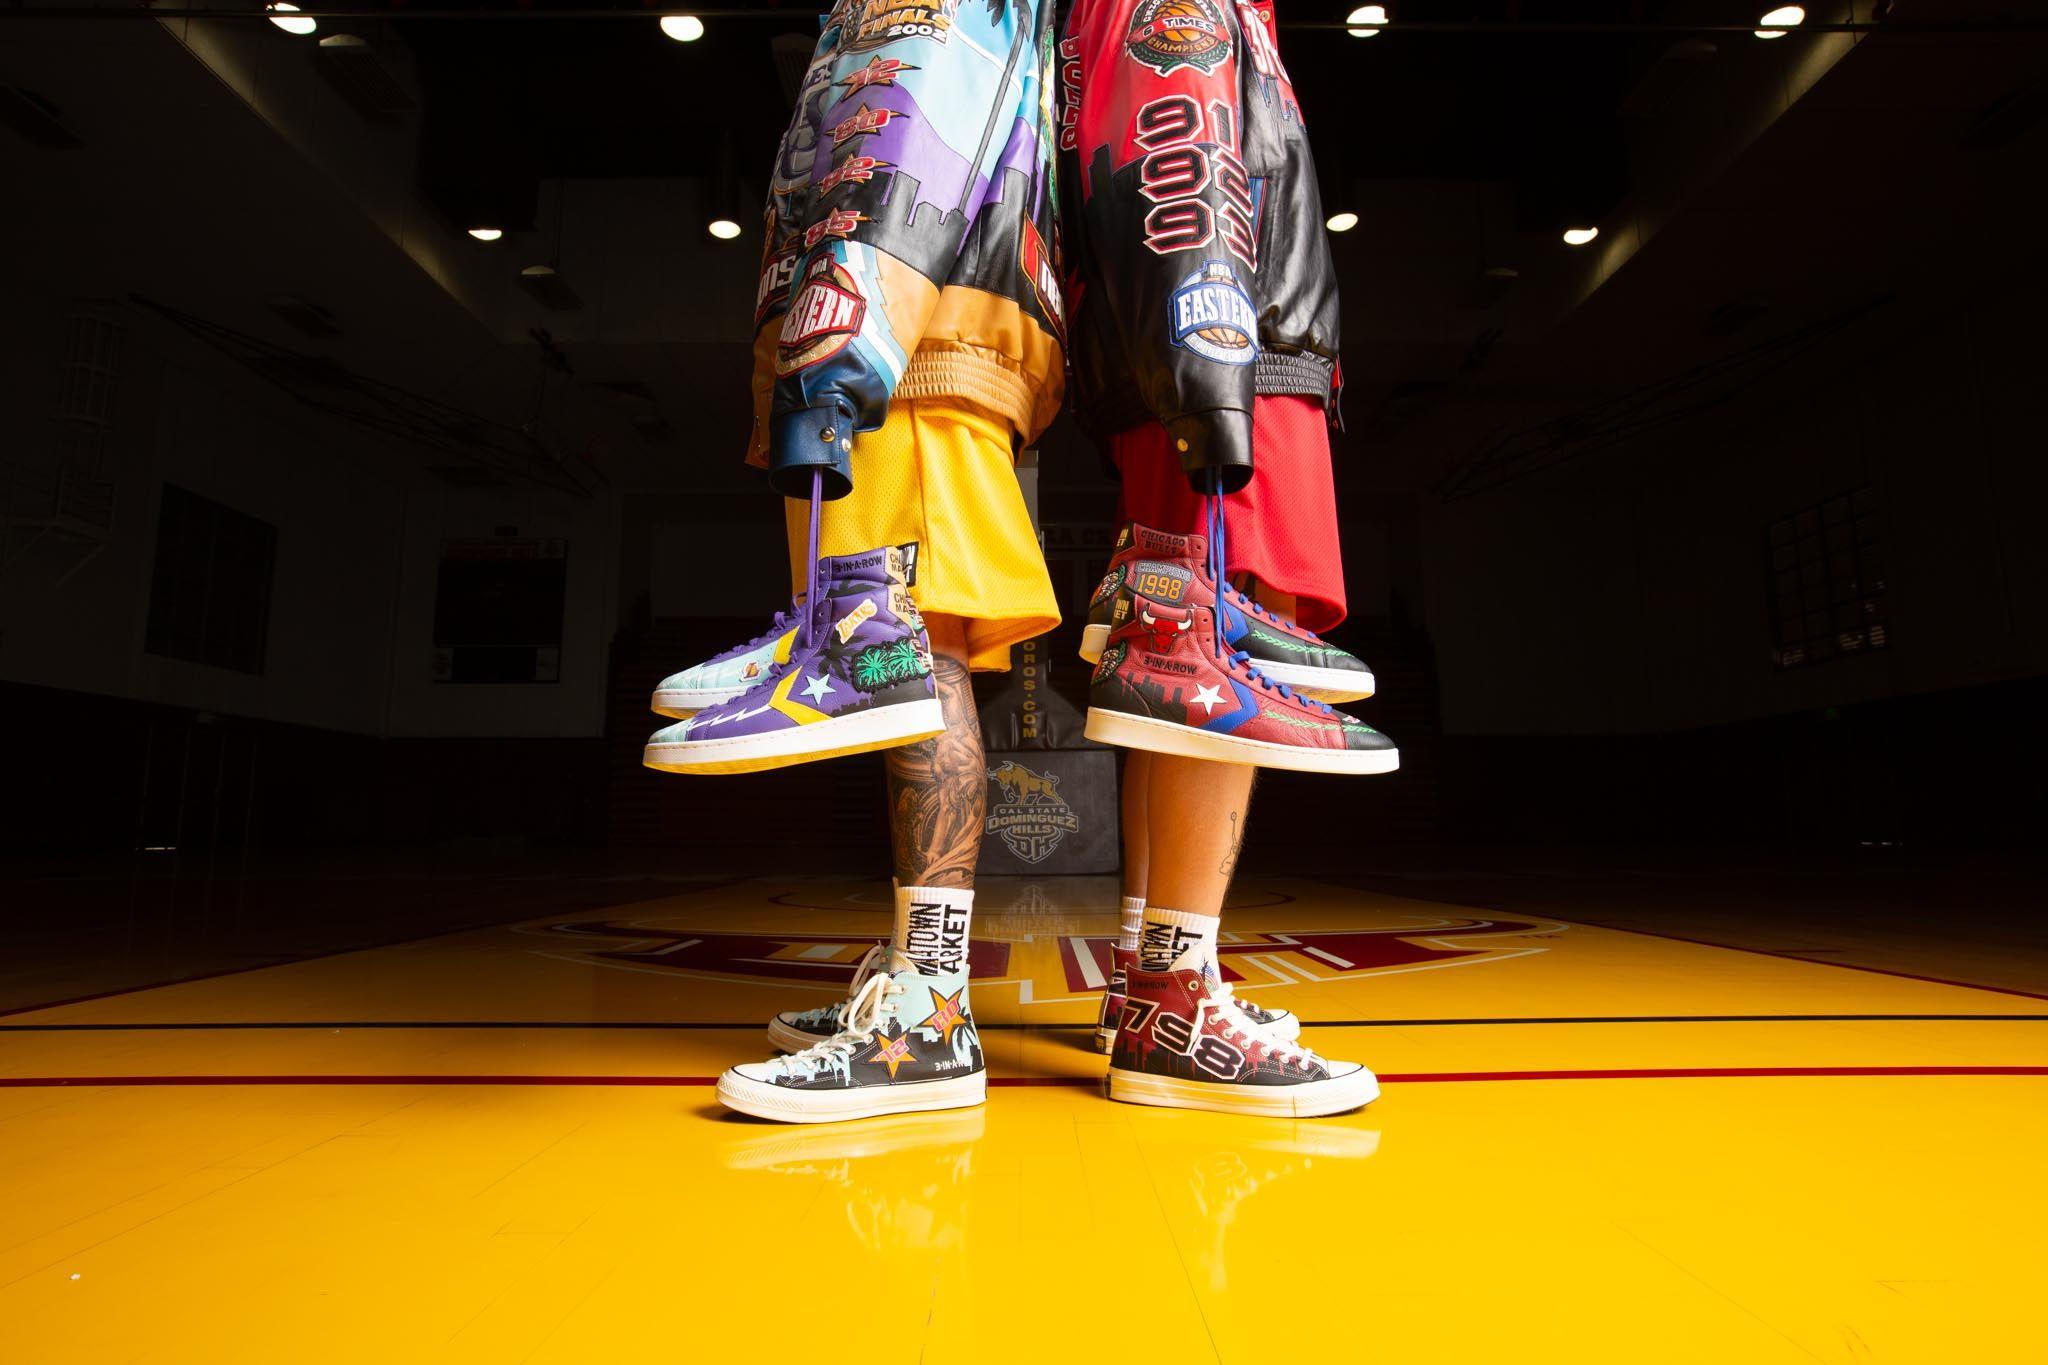 Jeff Hamilton's Iconic NBA Jackets Make Perfect Sense as Sneakers 3